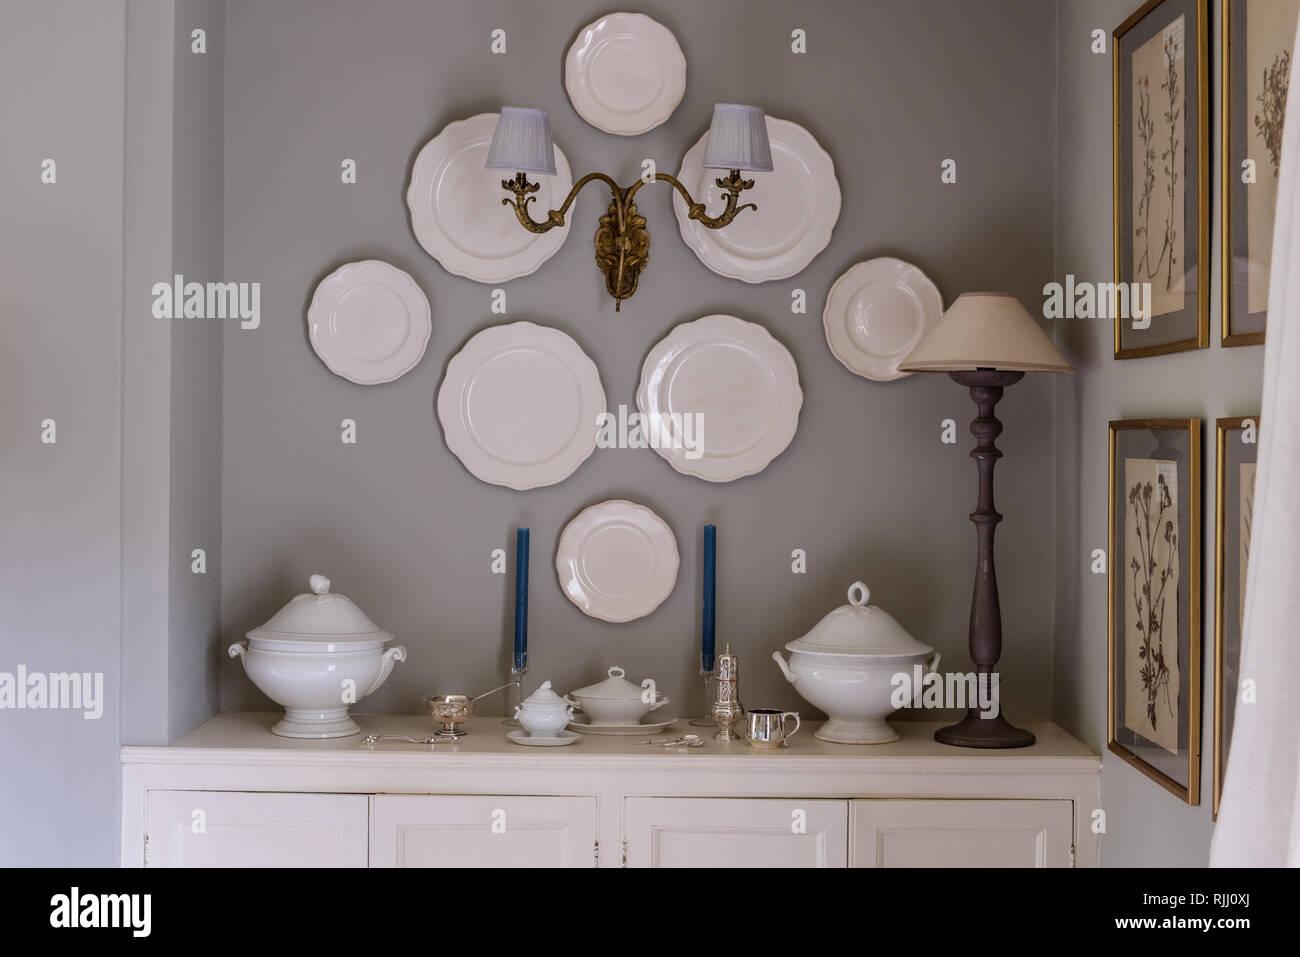 Decorative plates wall mounted Stock Photo